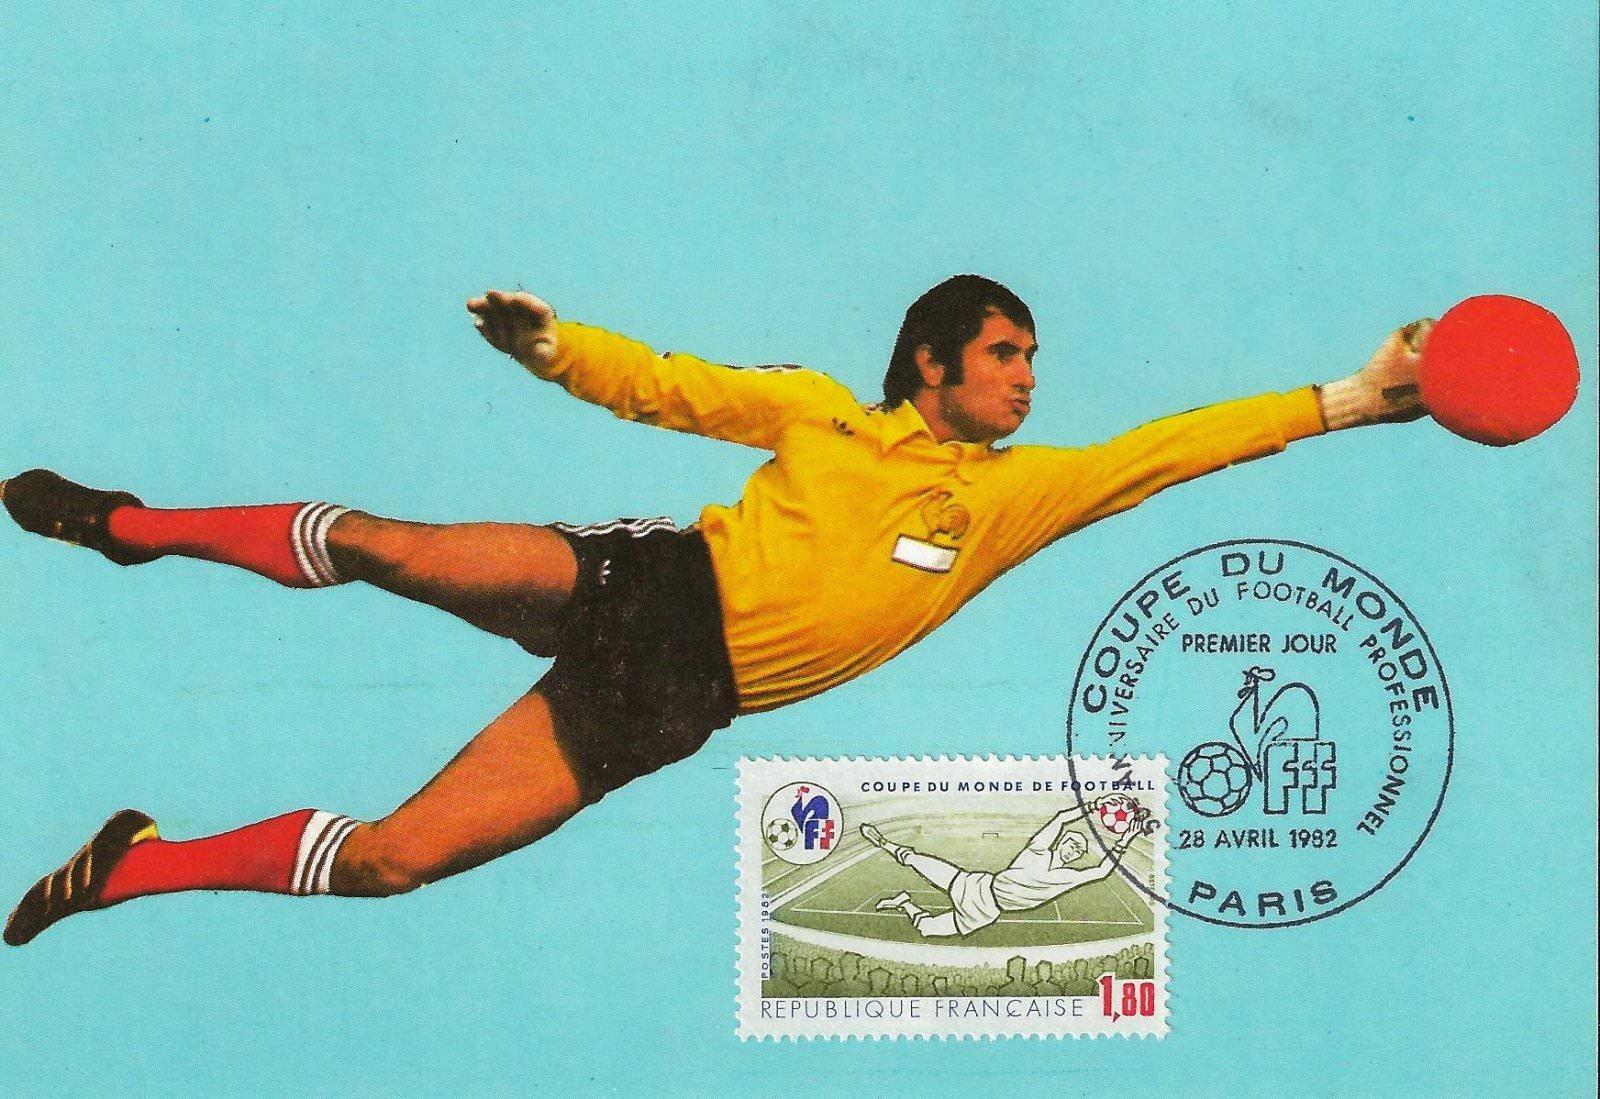 Carte maximum 1982 coupe du monde de football paris cartes maximum sport philatema - Coupe du monde de football 1982 ...